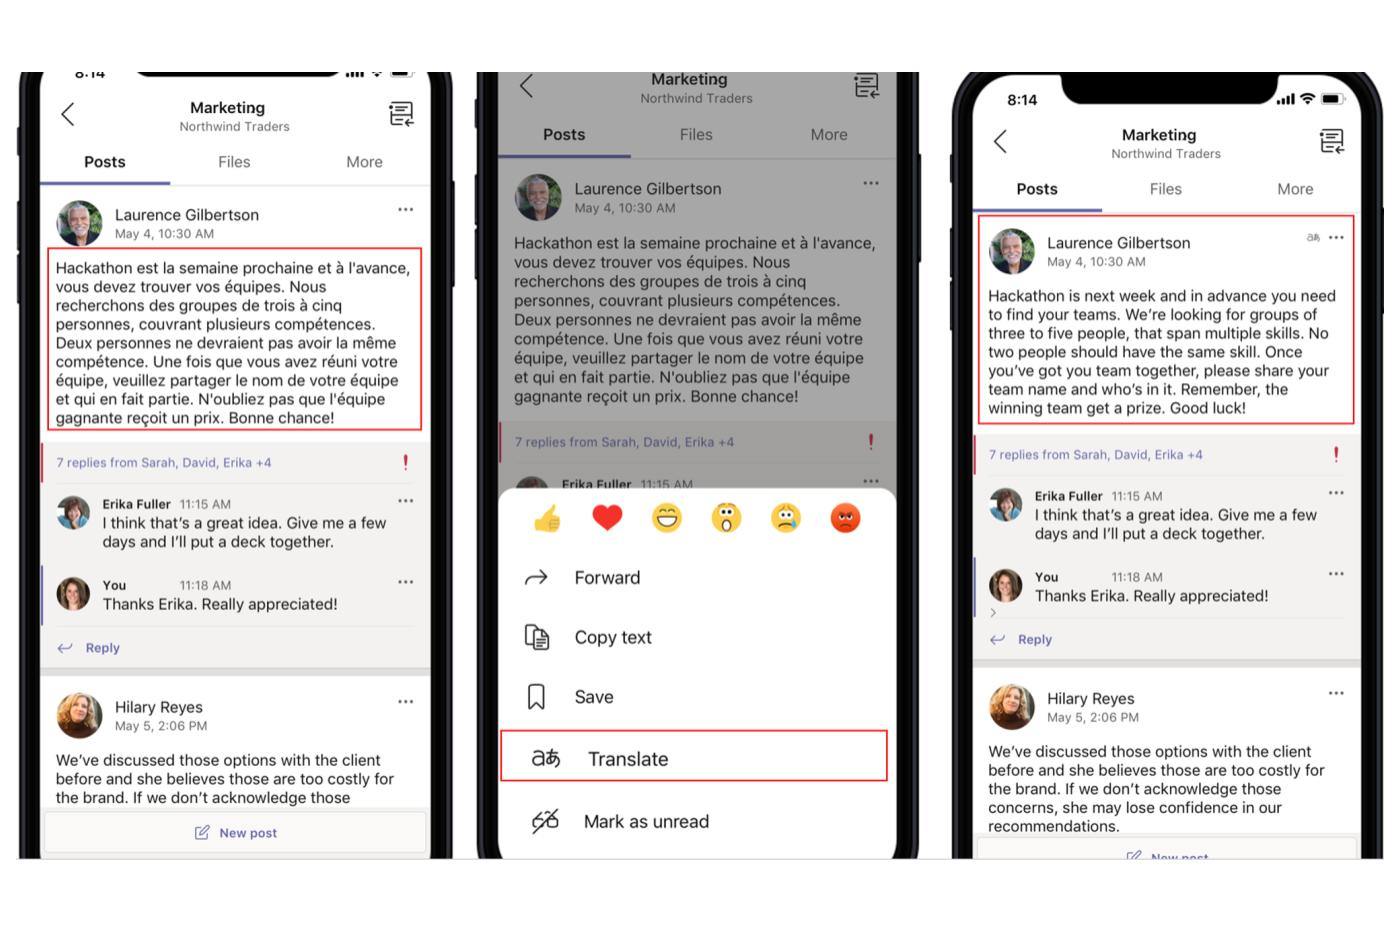 Microsoft Teams traduction sur Android